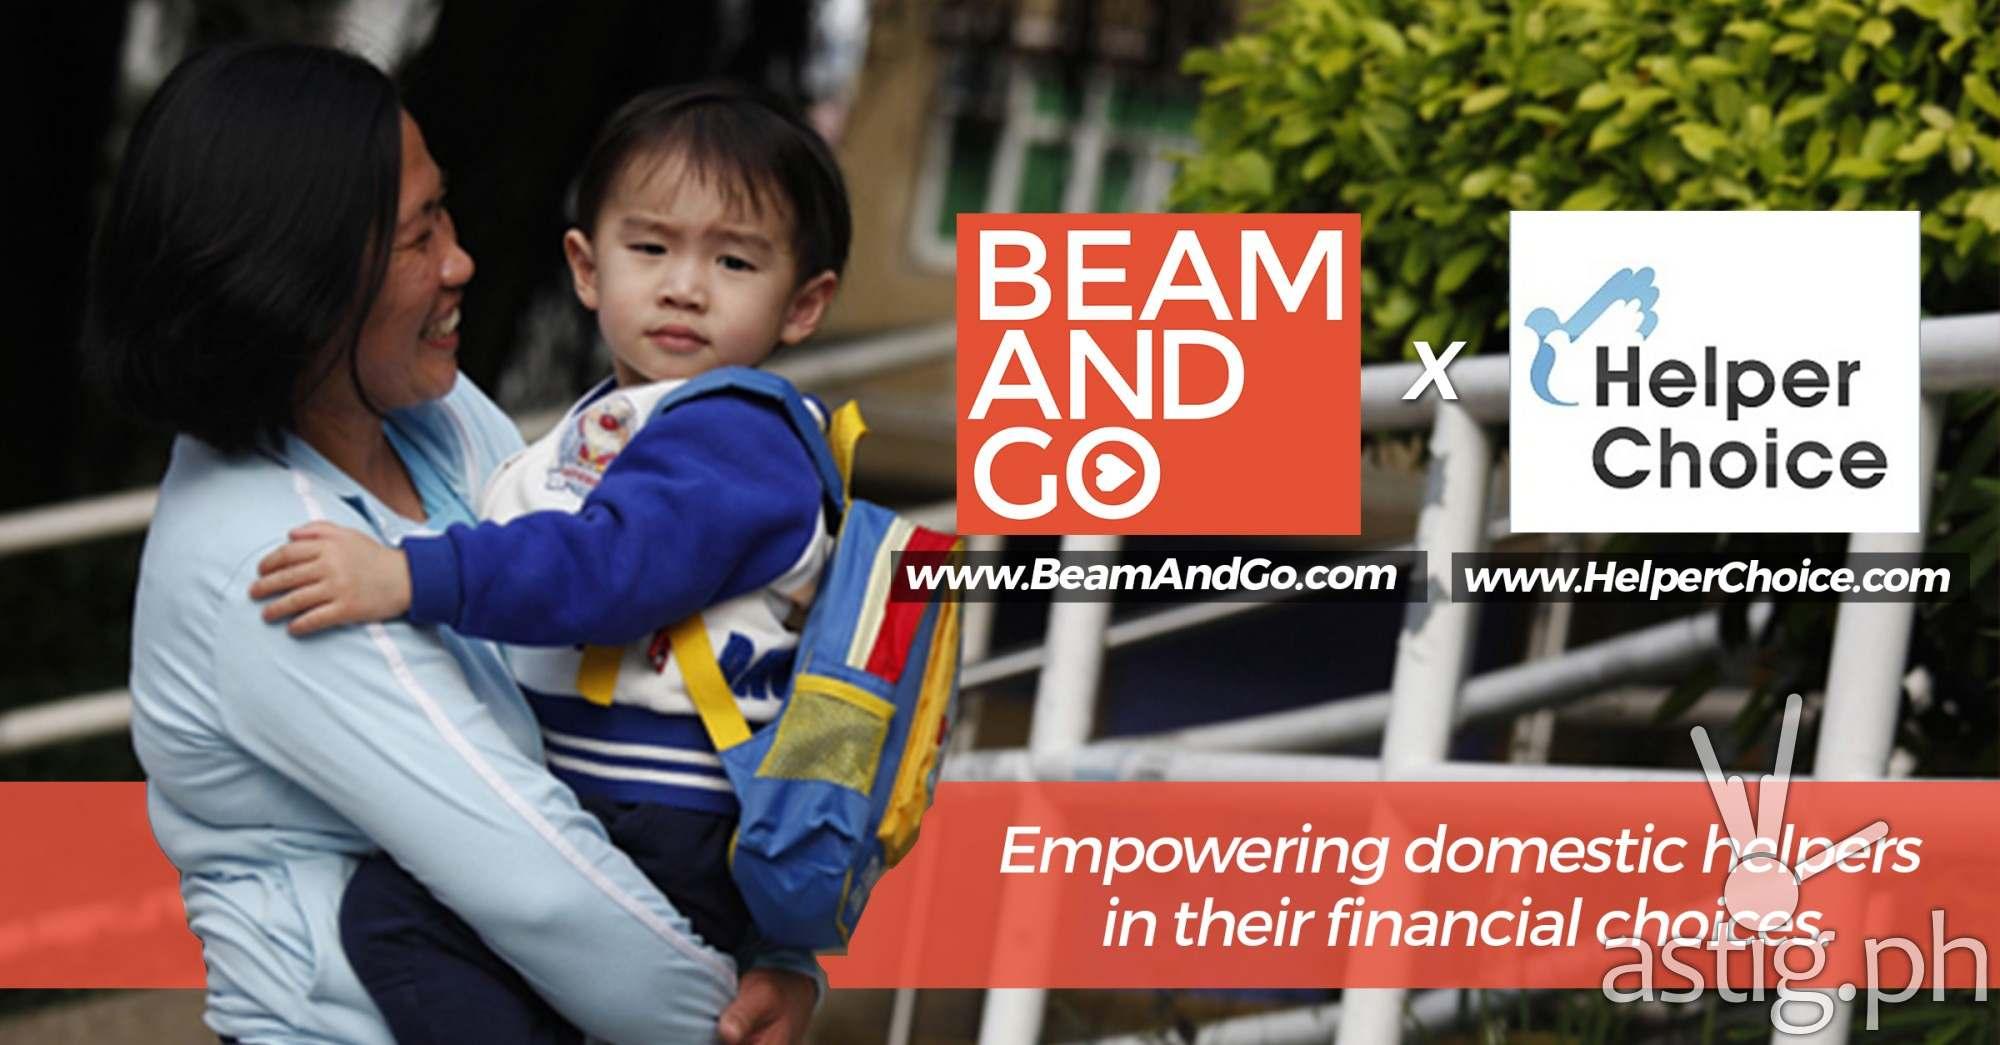 Beam And Go